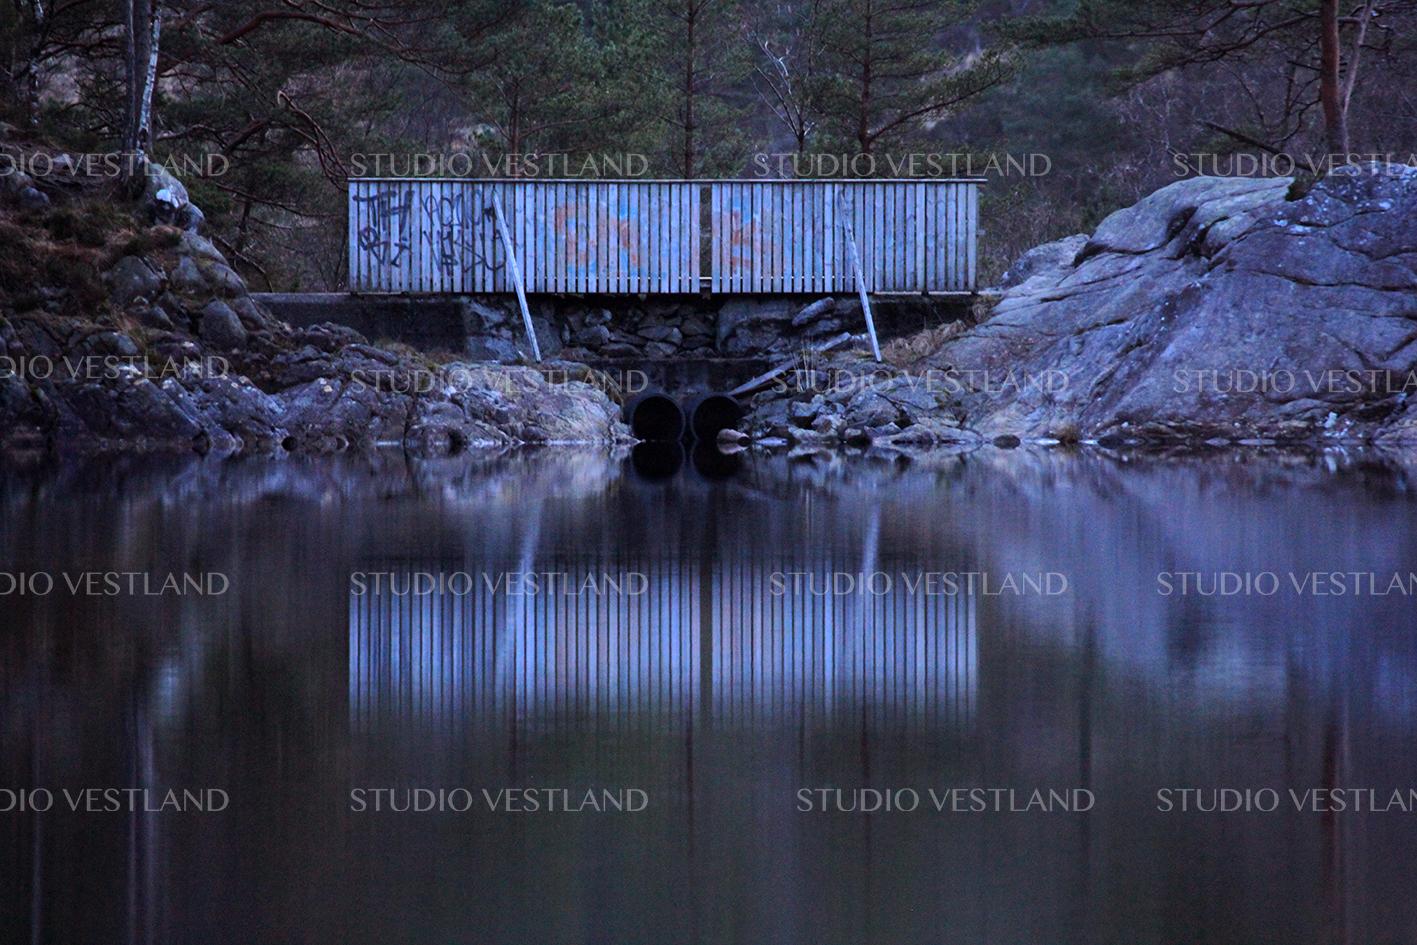 Studio Vestland - Brodemning